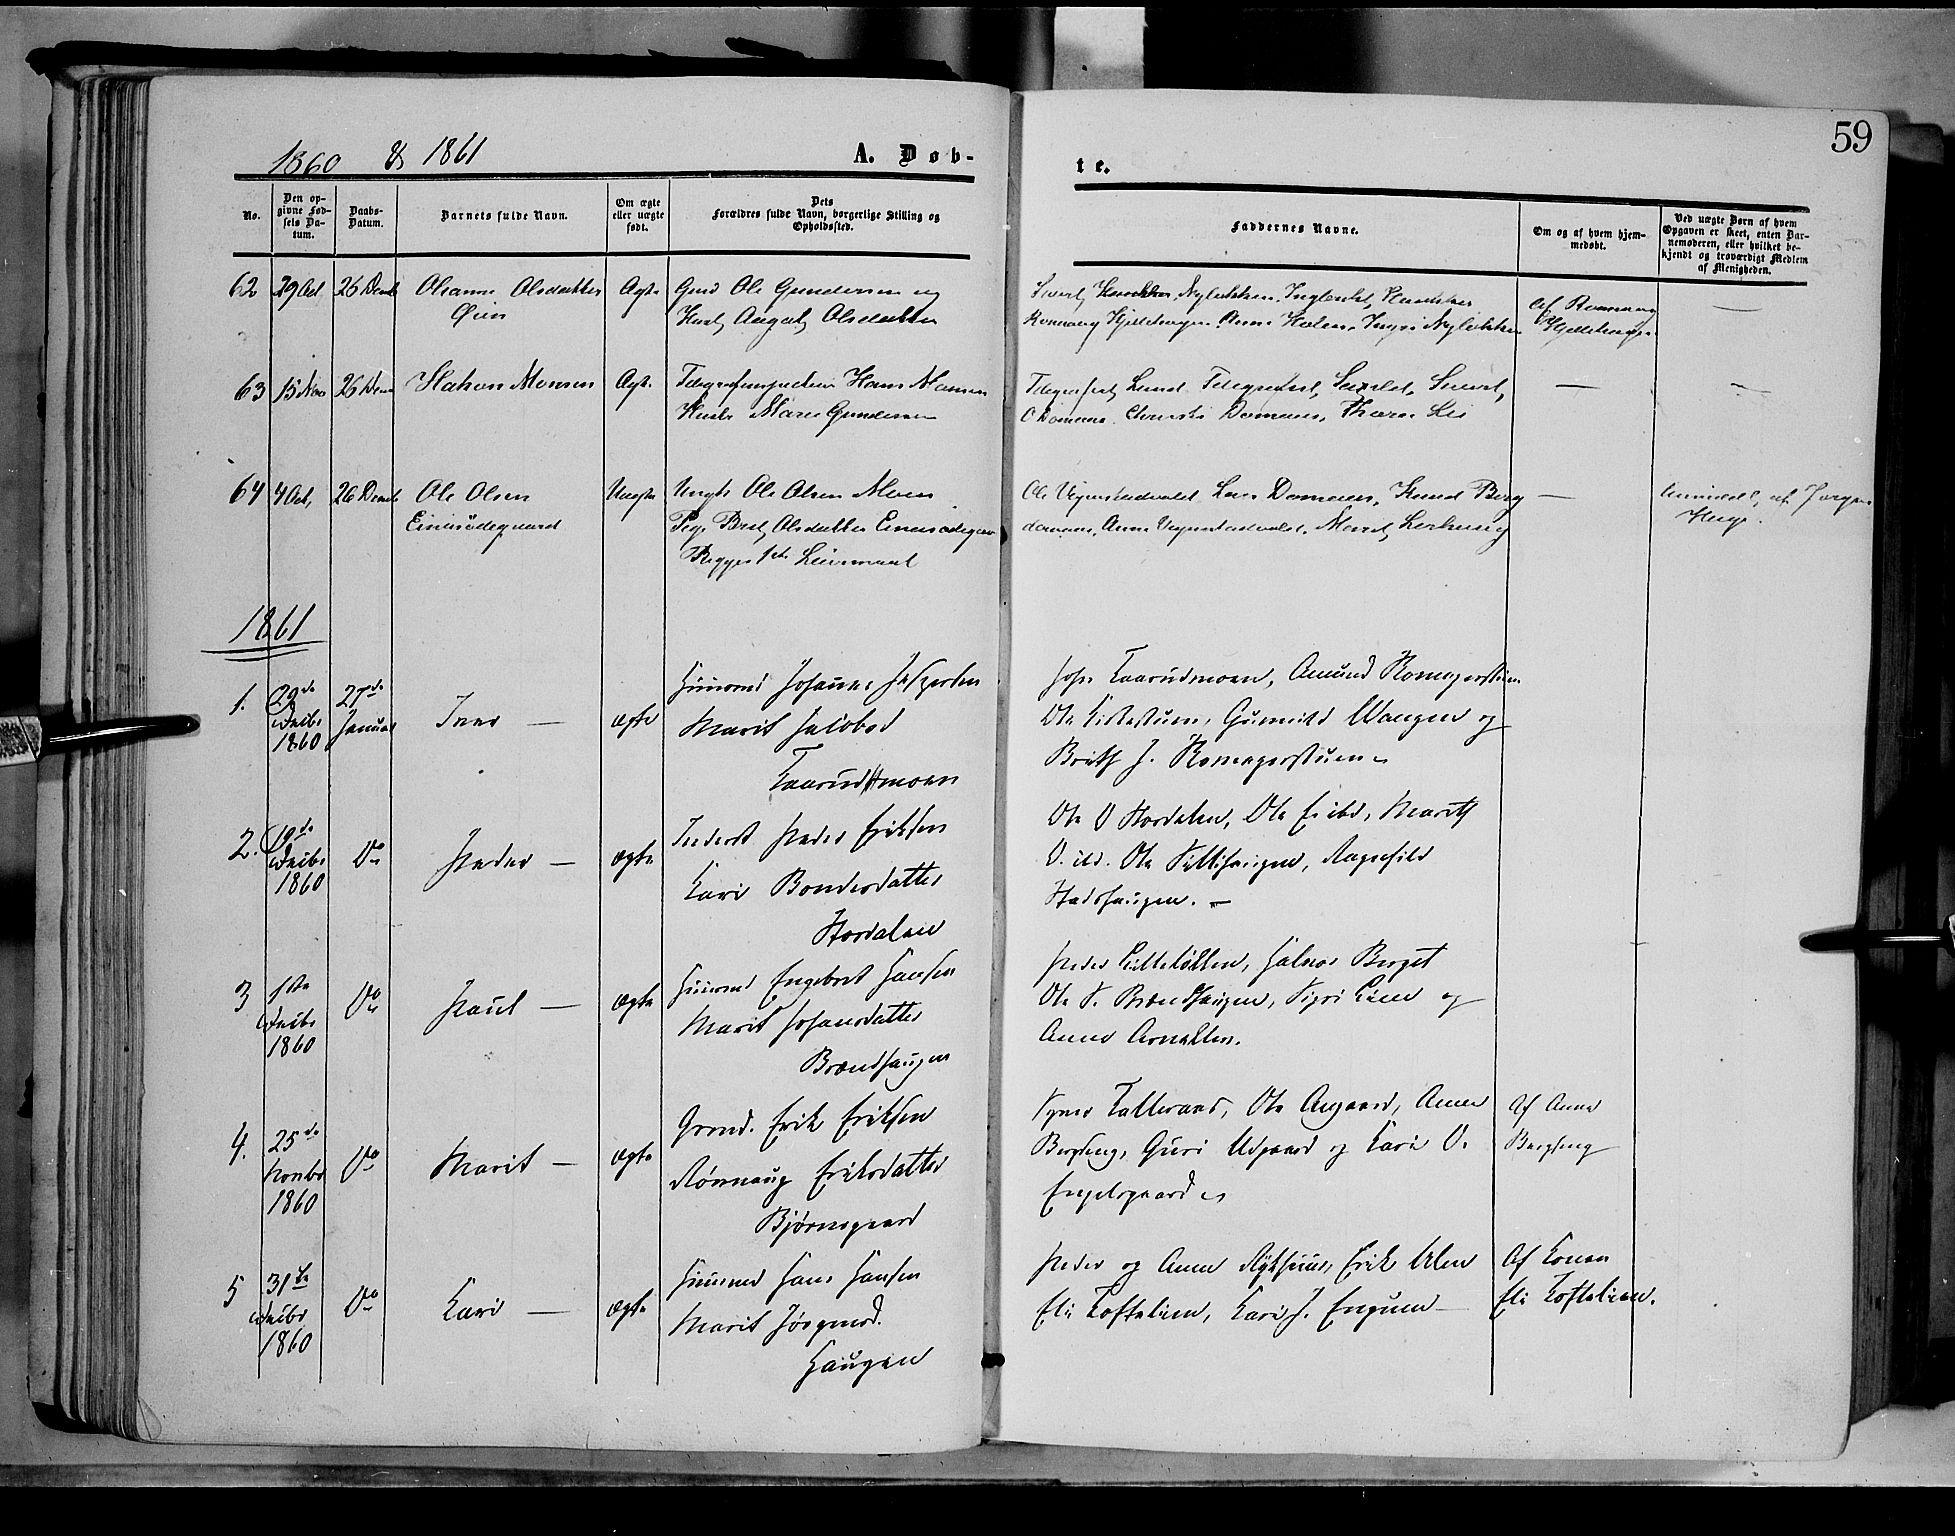 SAH, Dovre prestekontor, Ministerialbok nr. 1, 1854-1878, s. 59